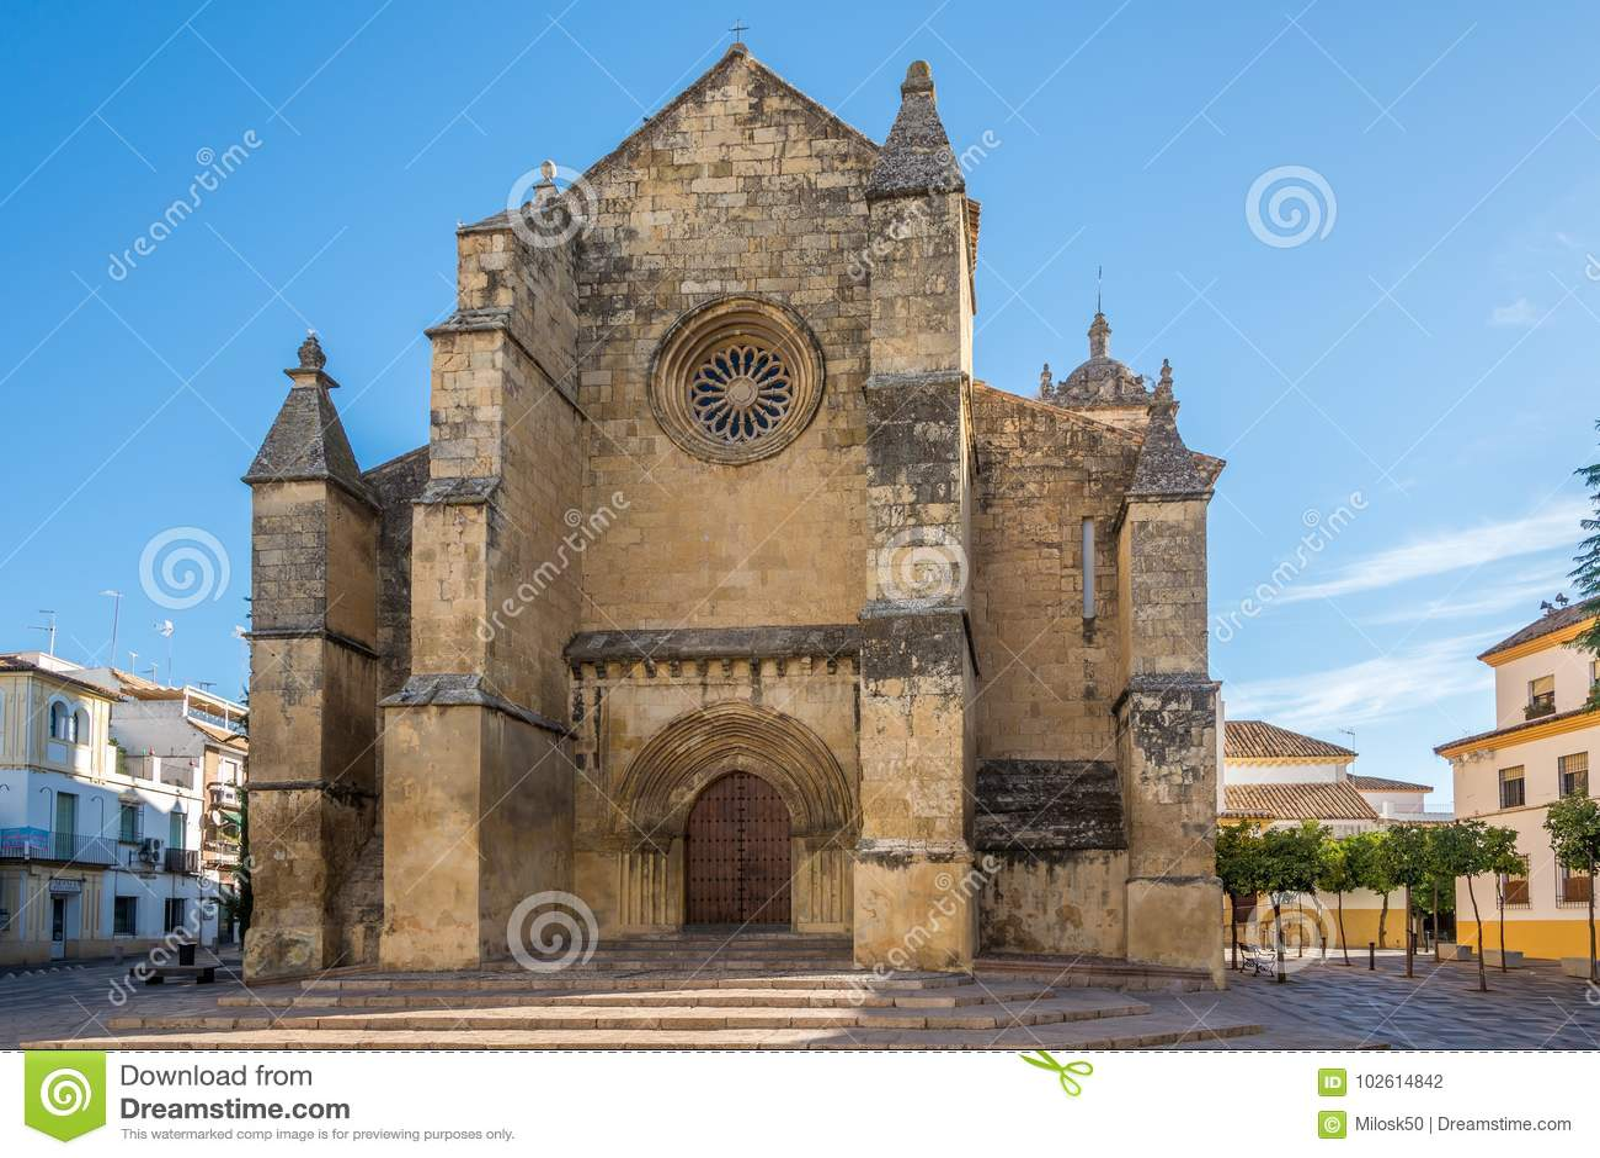 View At The Church Of Santa Marina De Aguas Santas In Cordoba Spain Stock Photo Image Of Andalusia Place 102614842